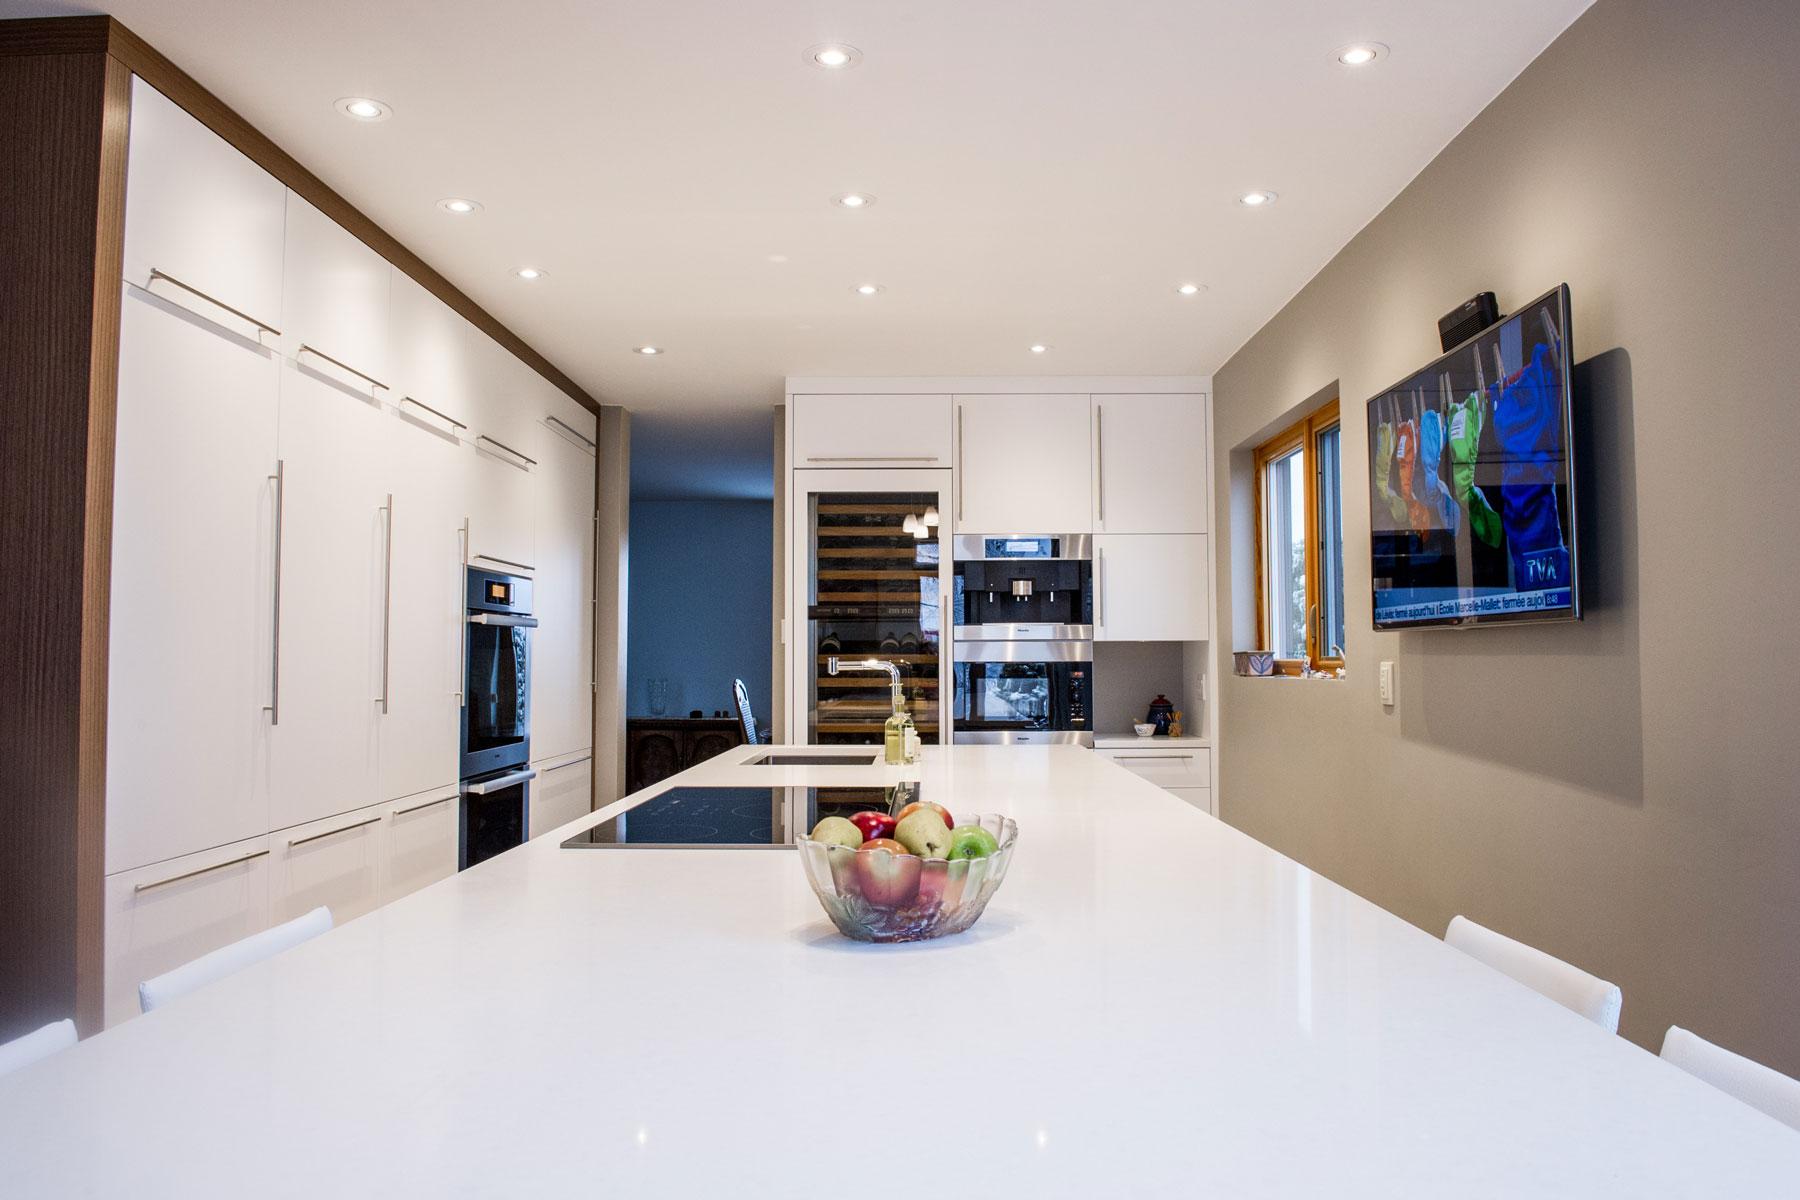 armoires acrylique kalla cuisine design. Black Bedroom Furniture Sets. Home Design Ideas